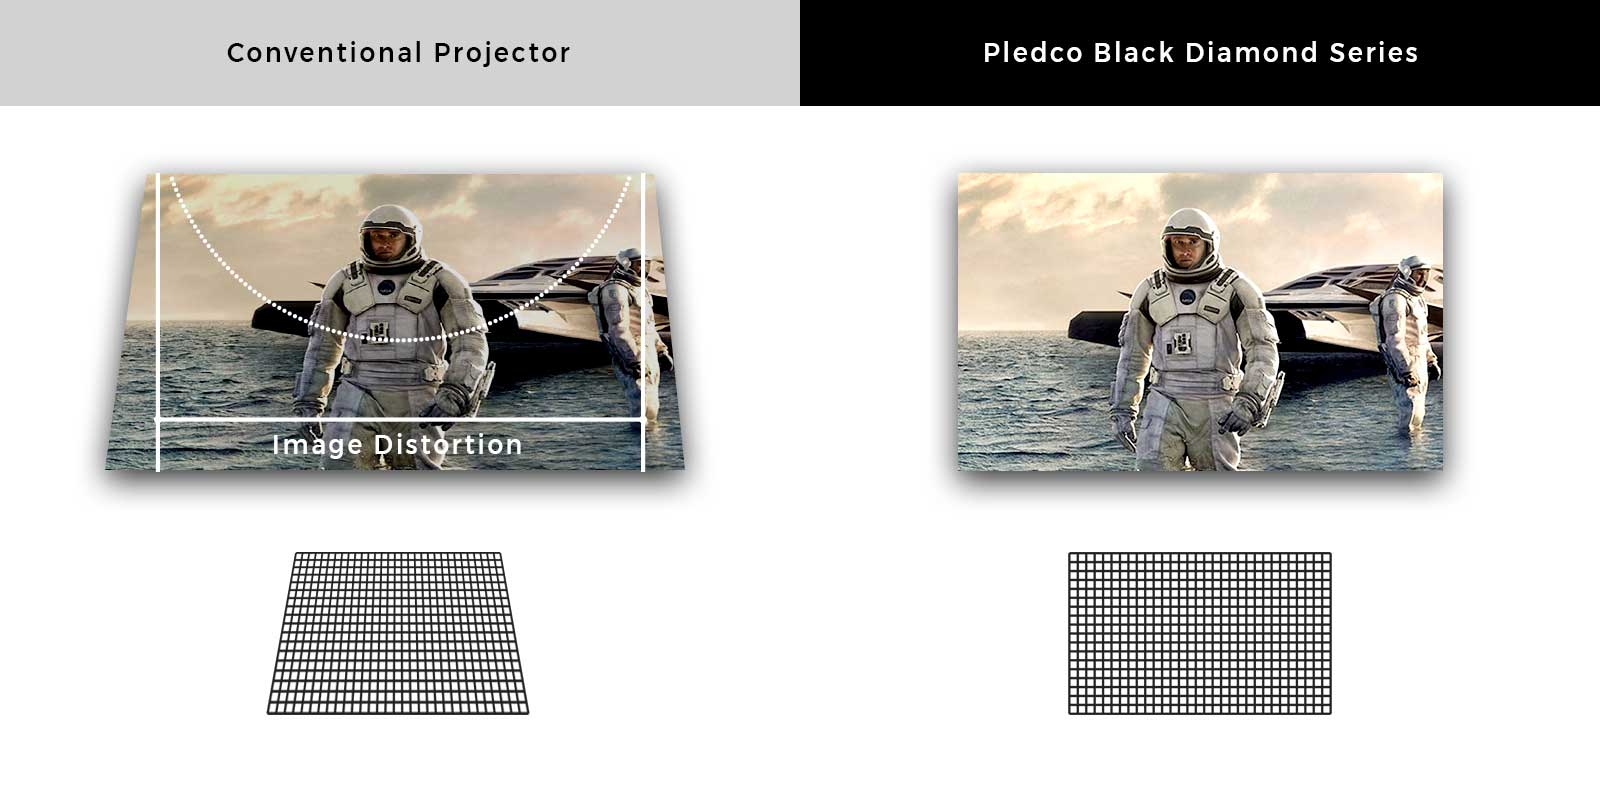 black diamond features